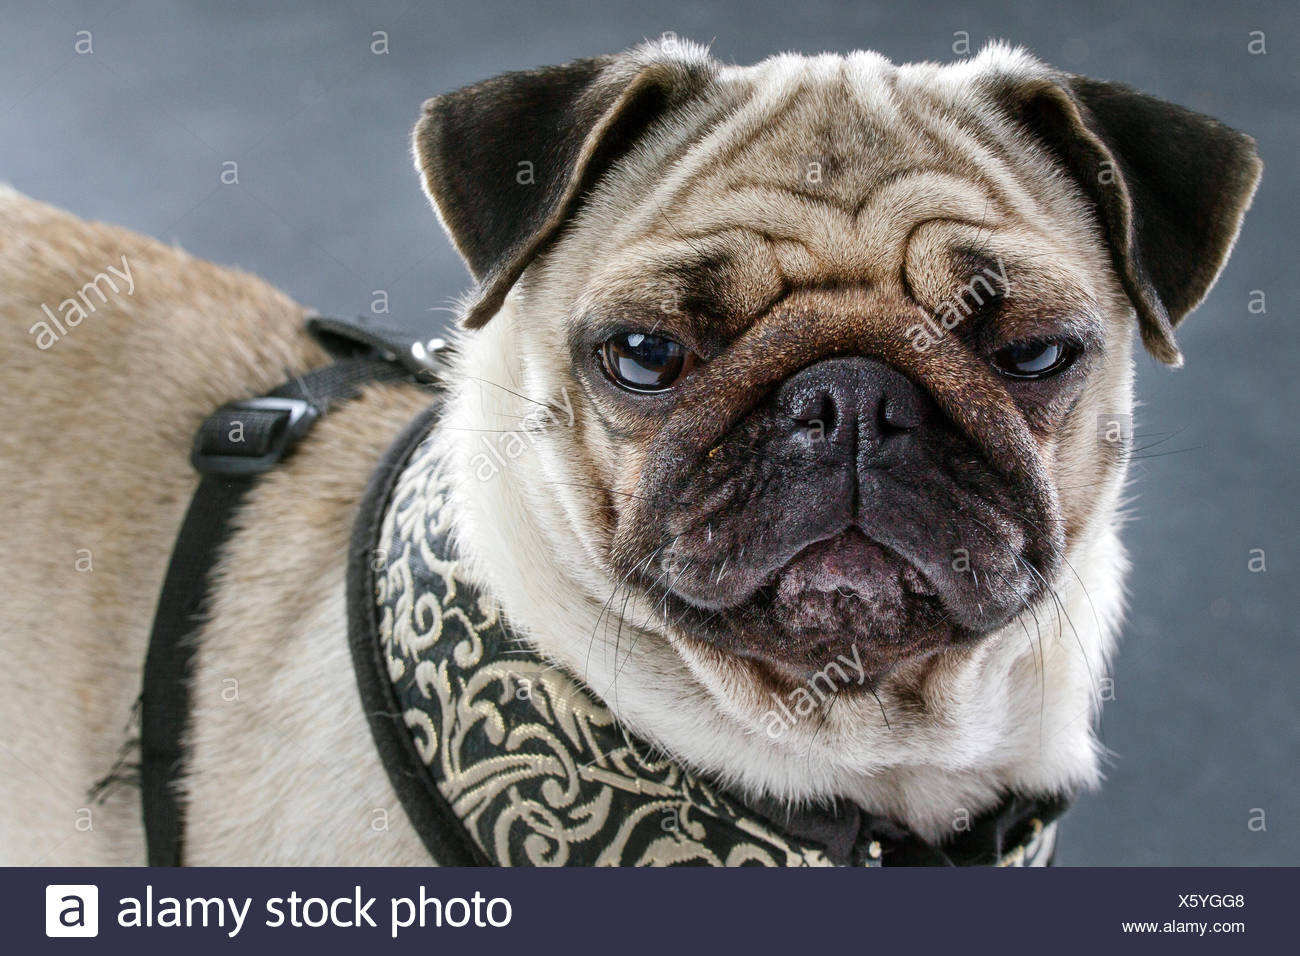 Pug (Canis lupus f. familiaris), portrait of a moody pug - Stock Image